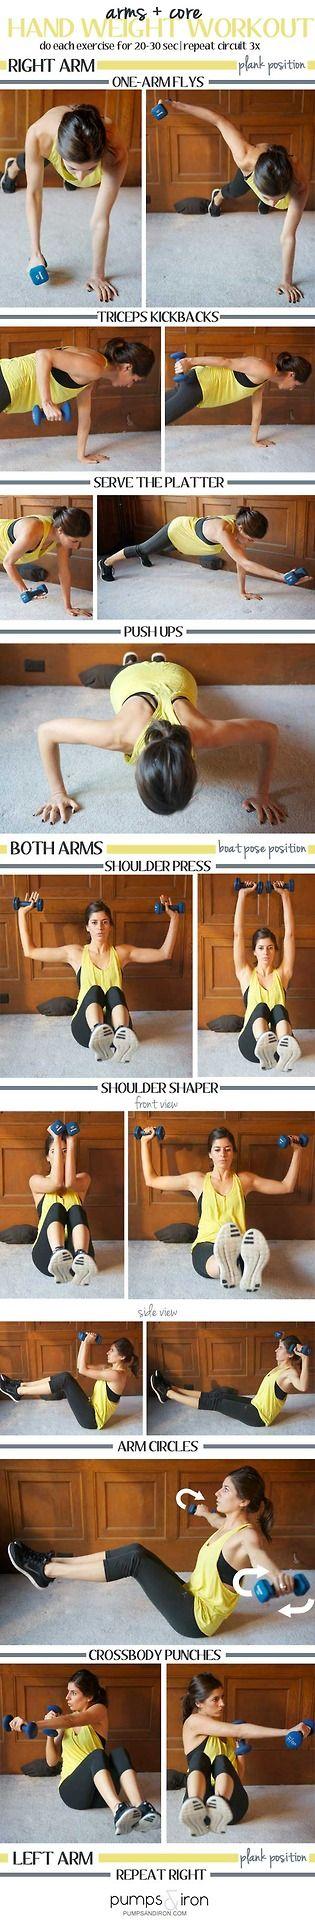 Hand weight workout.